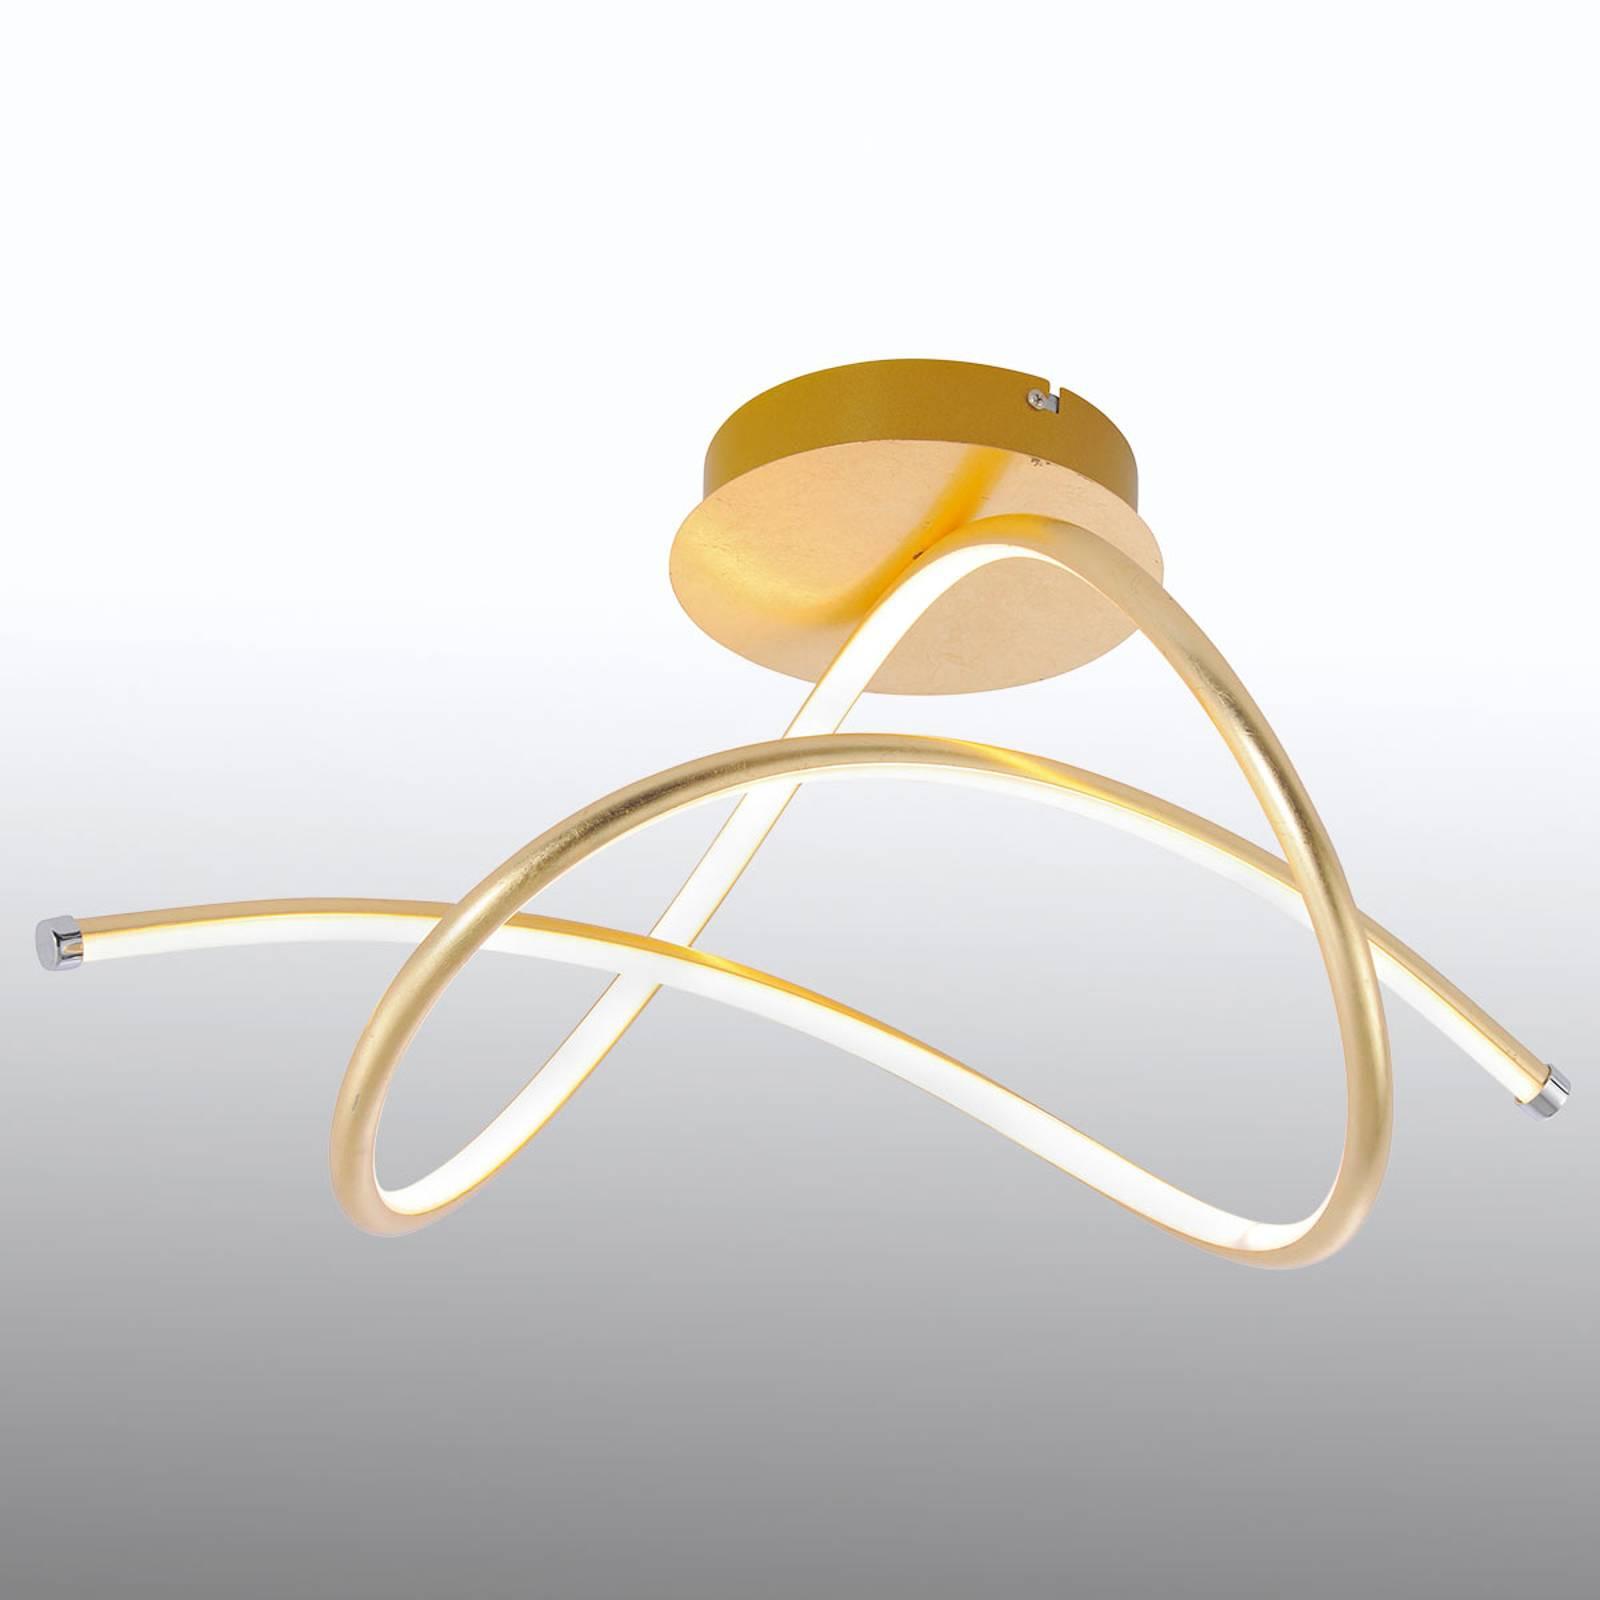 LED plafondlamp Violetta, gebogen, goud